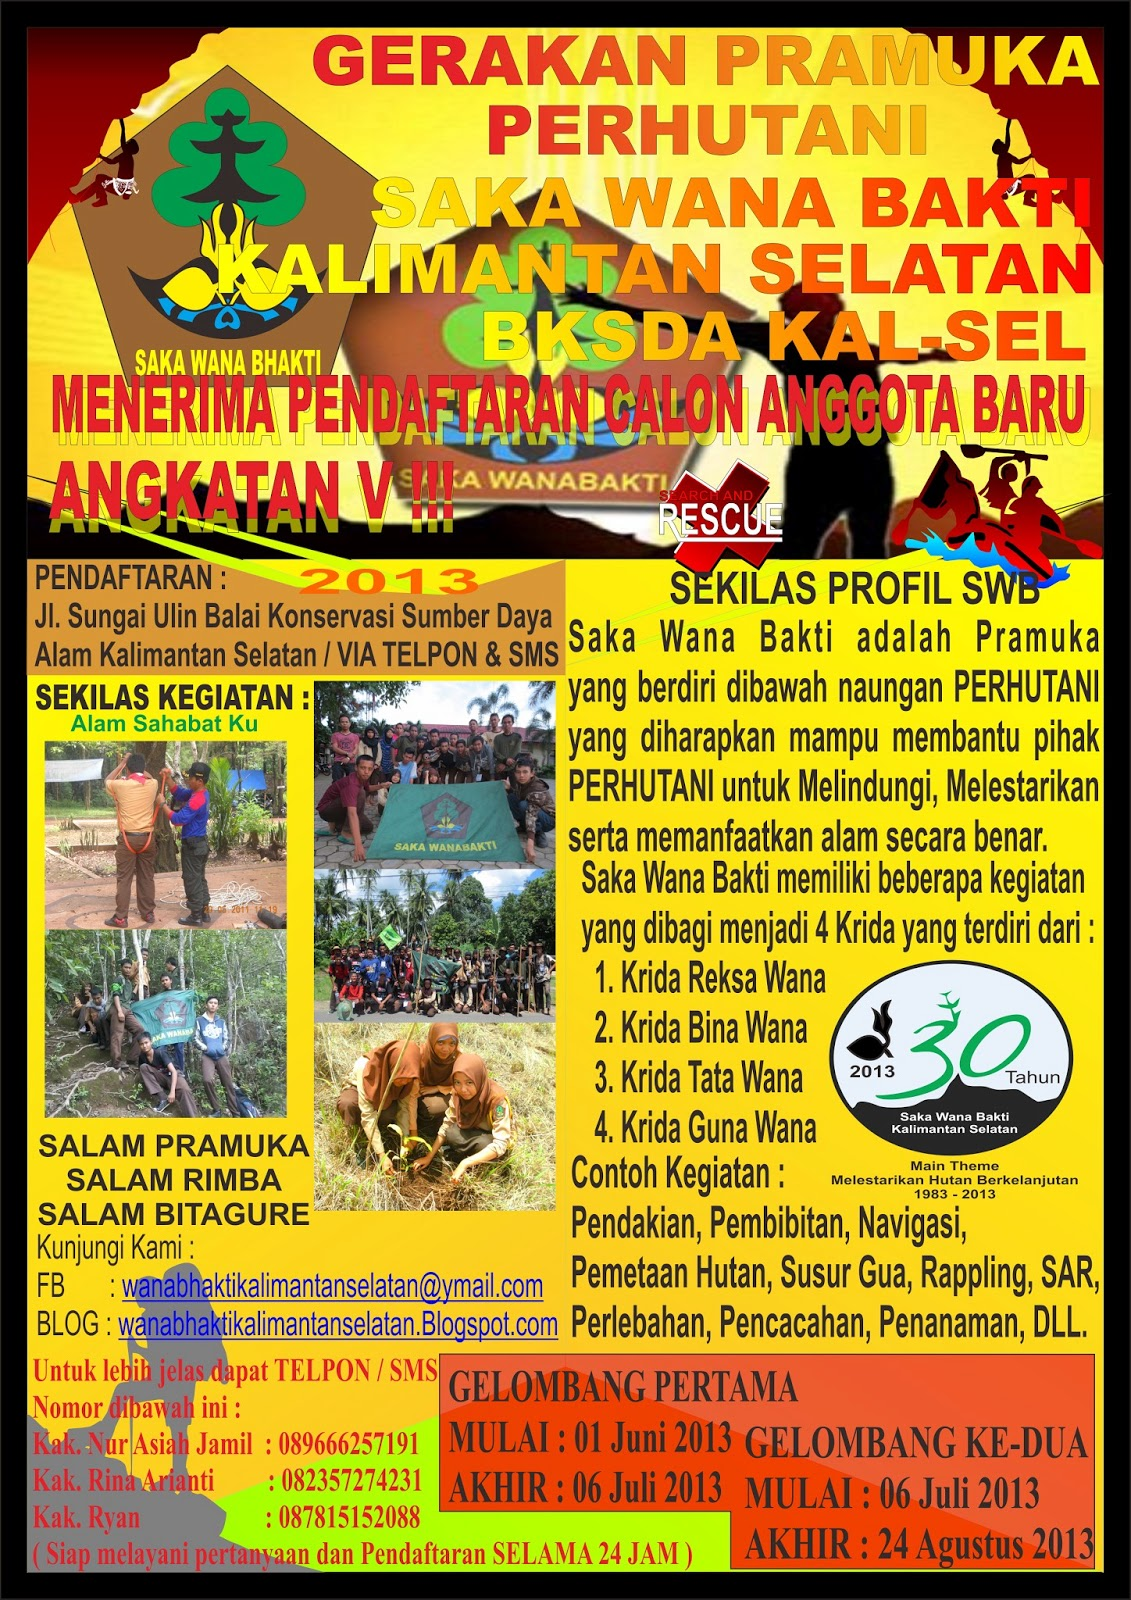 Saka Wana Bakti Kalimantan Selatan Pendaftaran Calon Anggota Baru